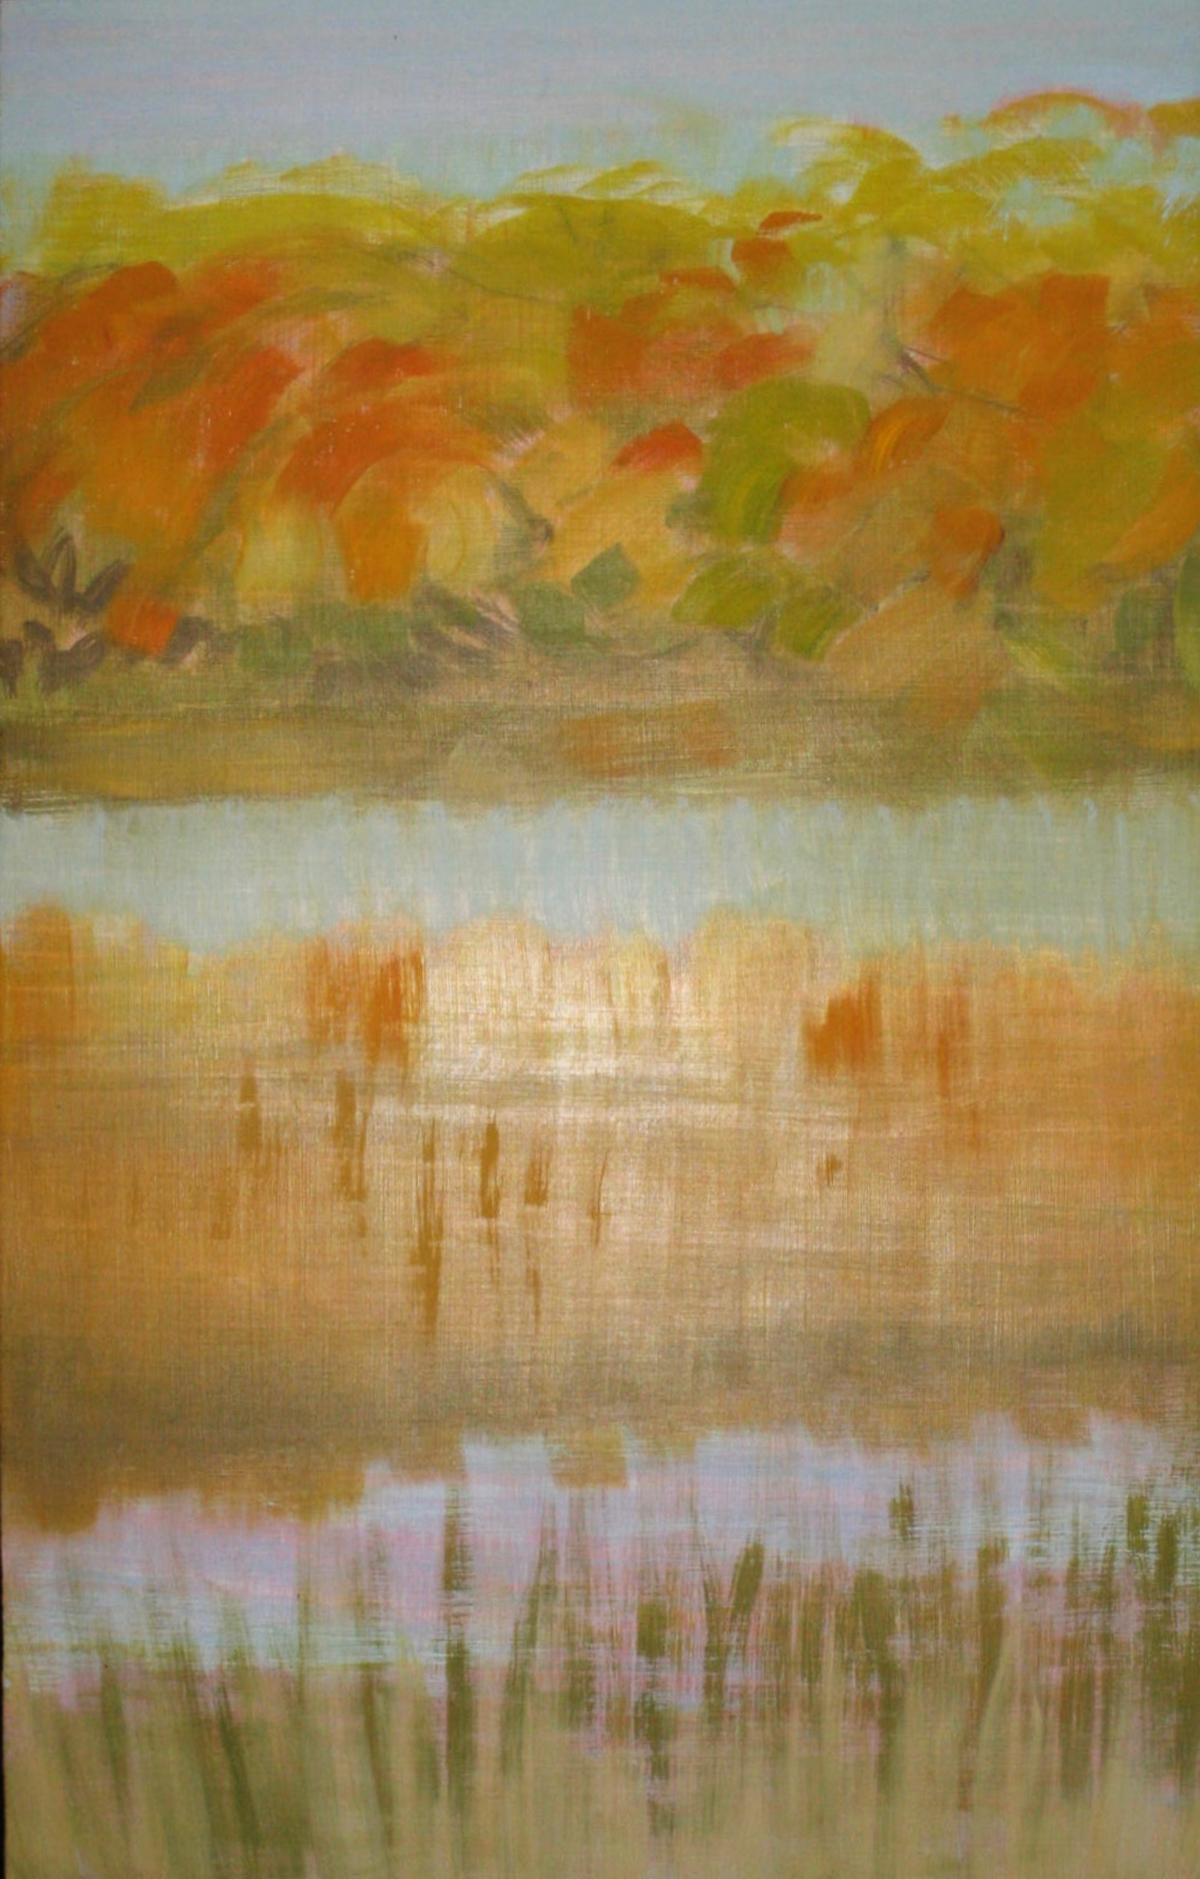 """Shelter Island Pond II"" ""19"" x 12"" oil on panel"